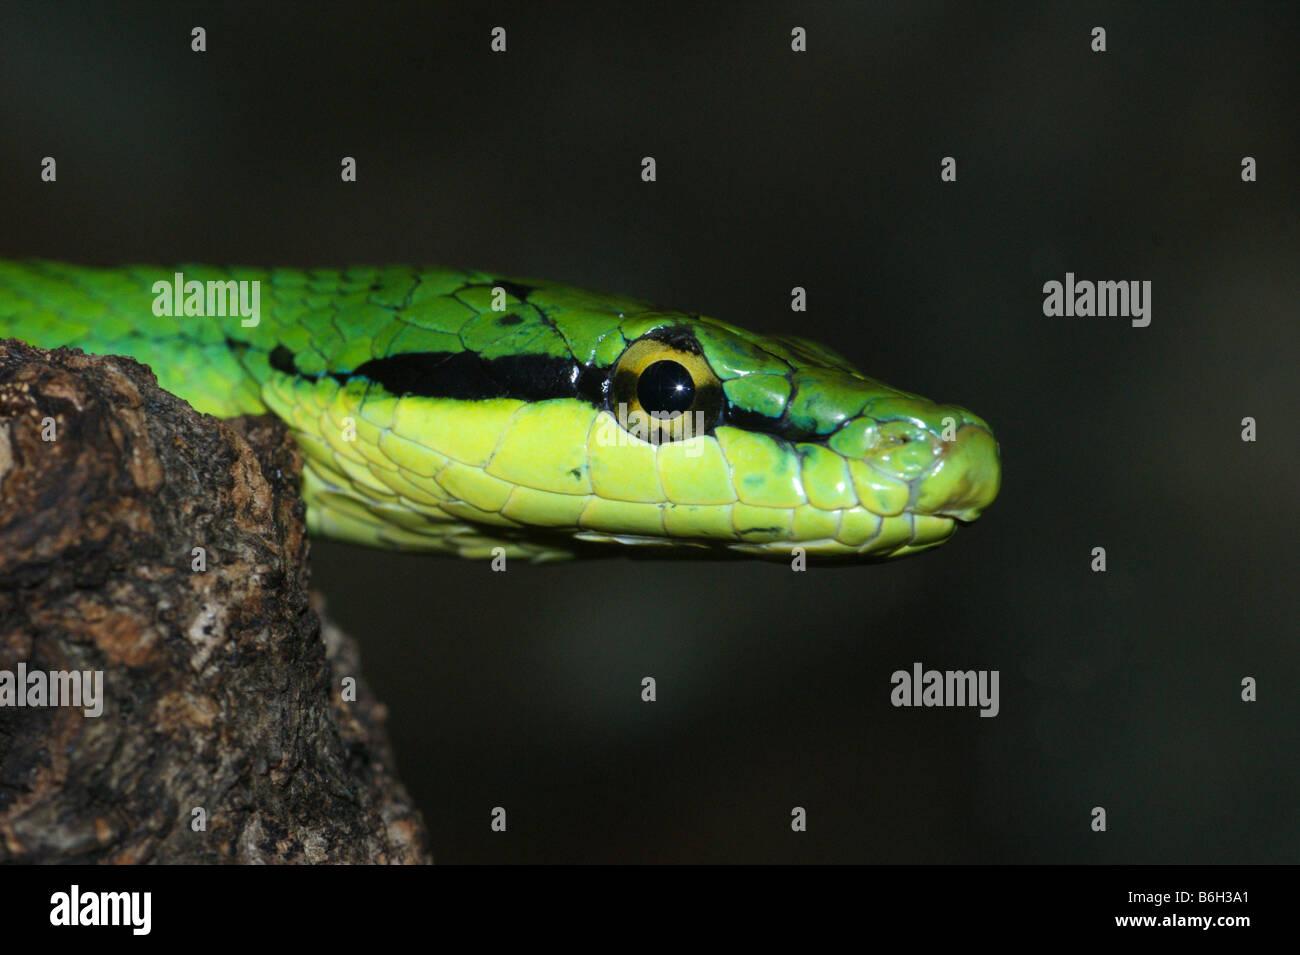 Elaphe  Rhadinophis frenata Rein Snake - Stock Image